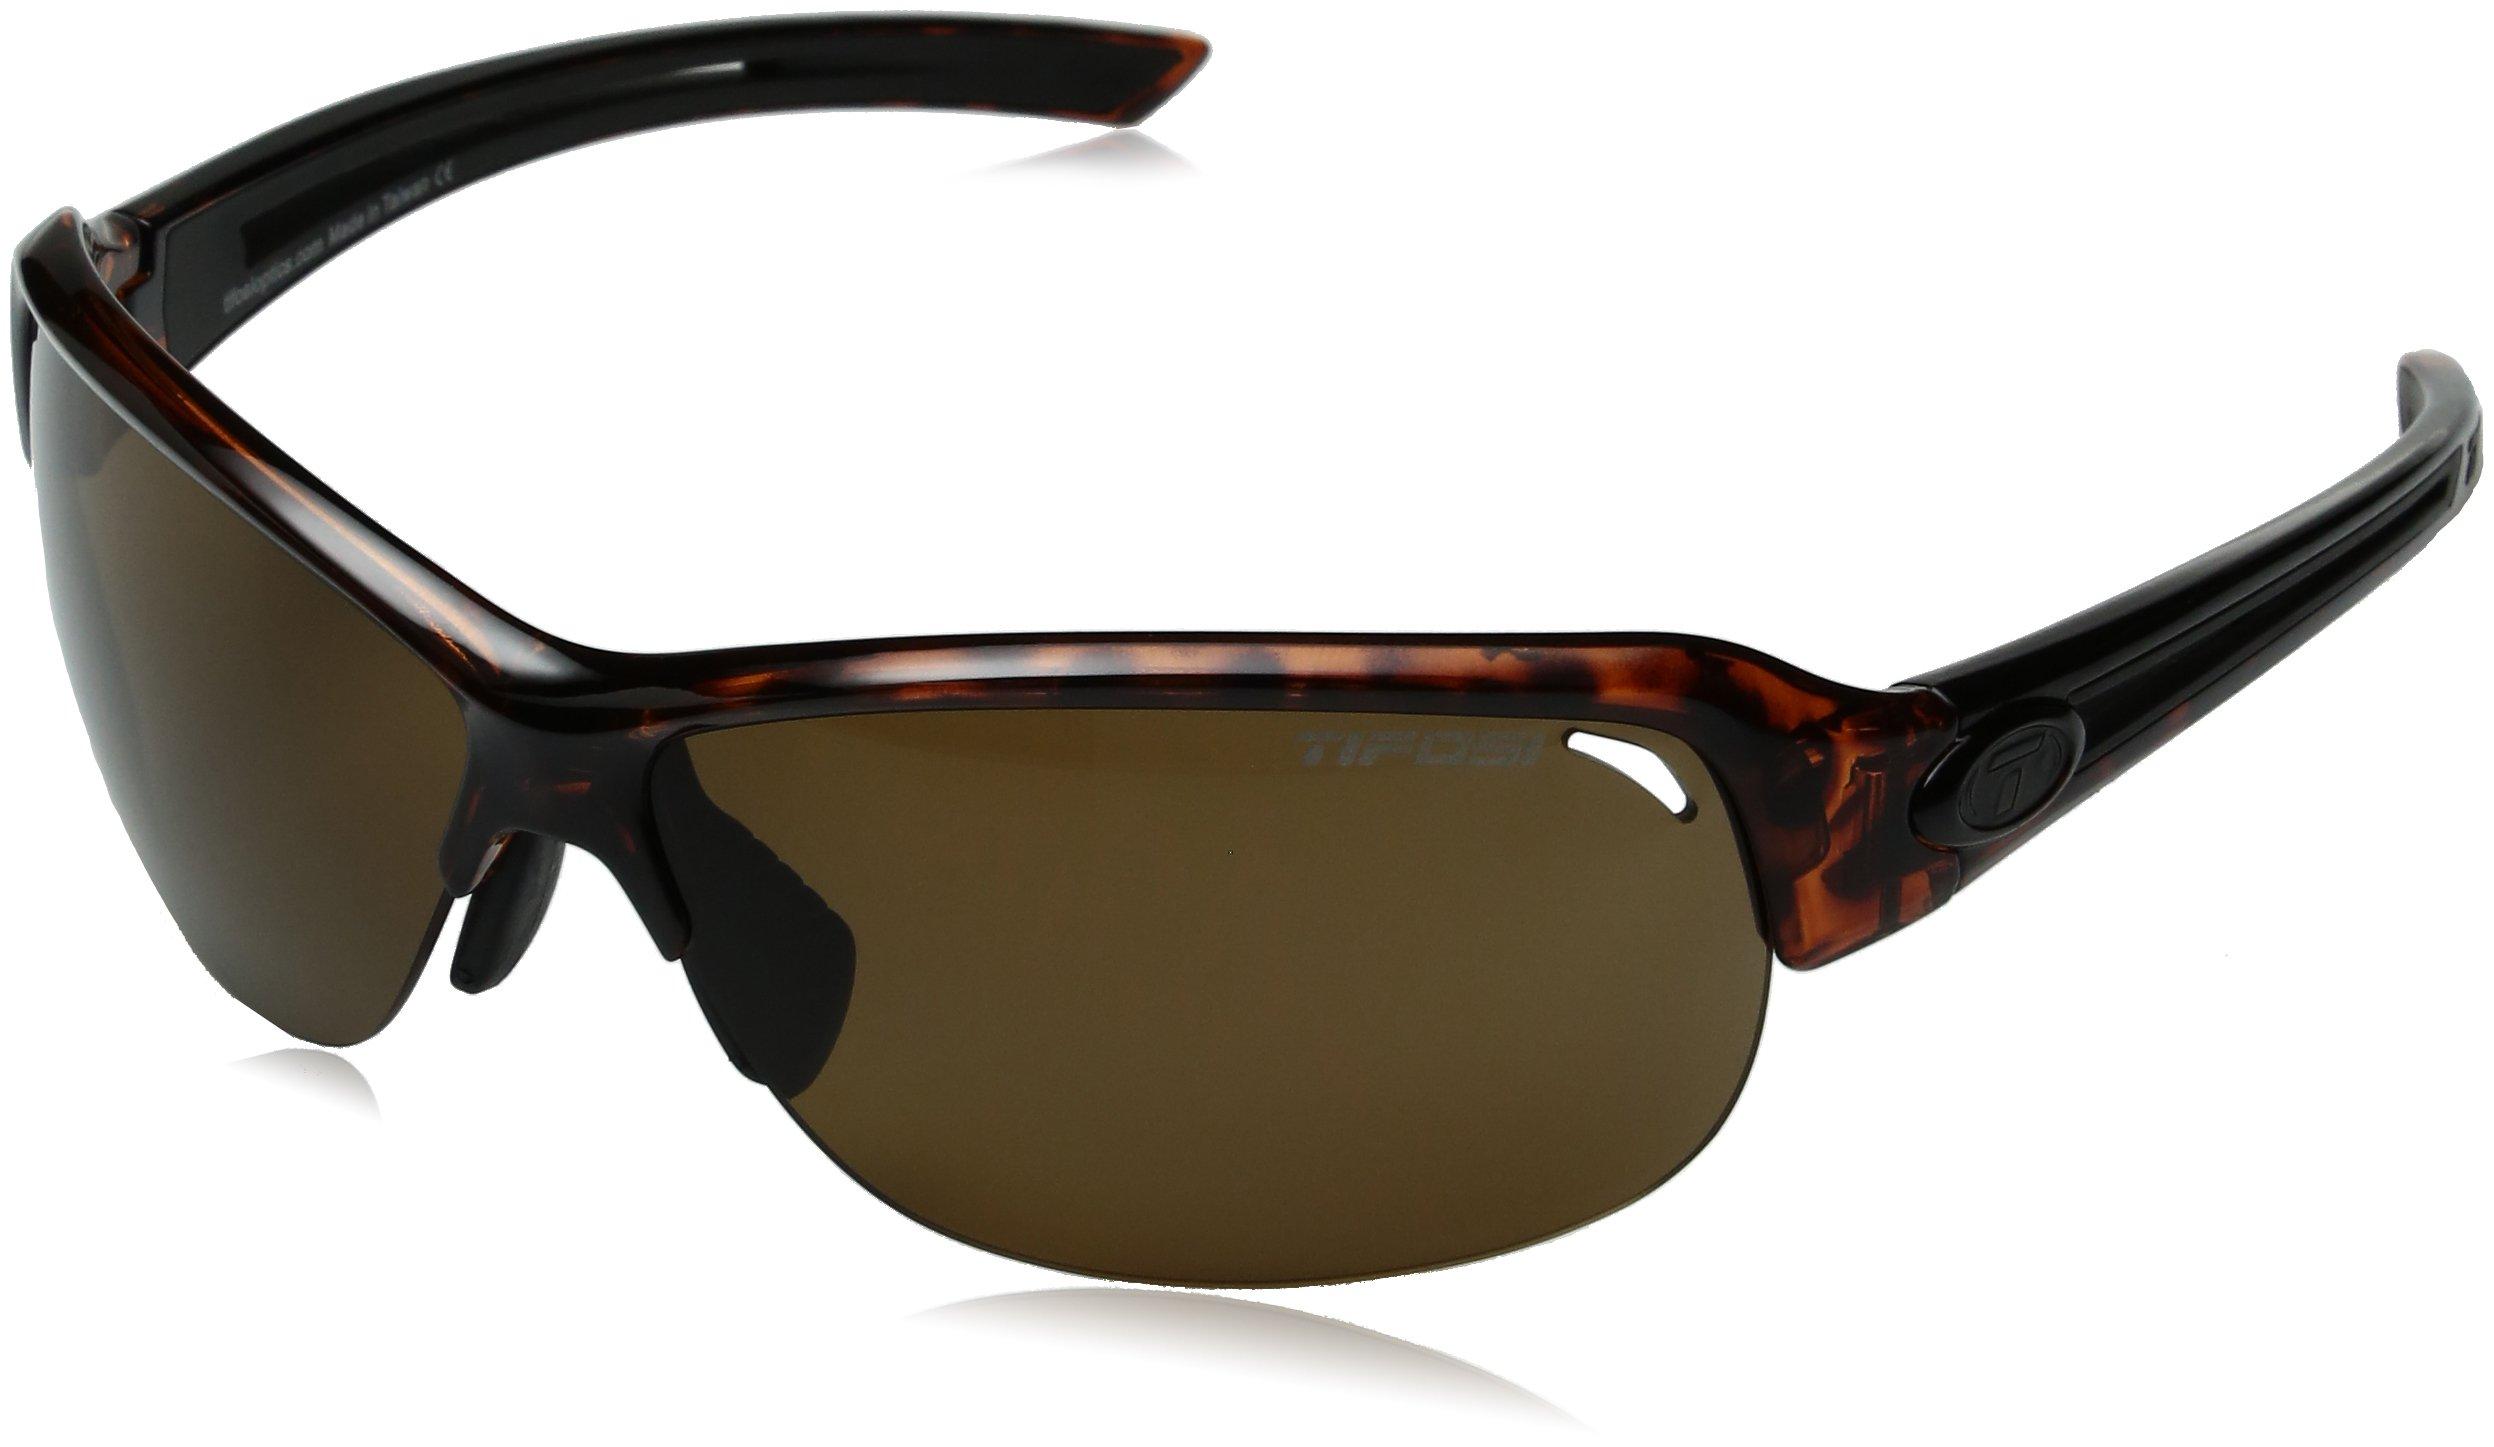 Tifosi Golf Mira Polarized Wrap Sunglasses, Tortoise, 142 mm